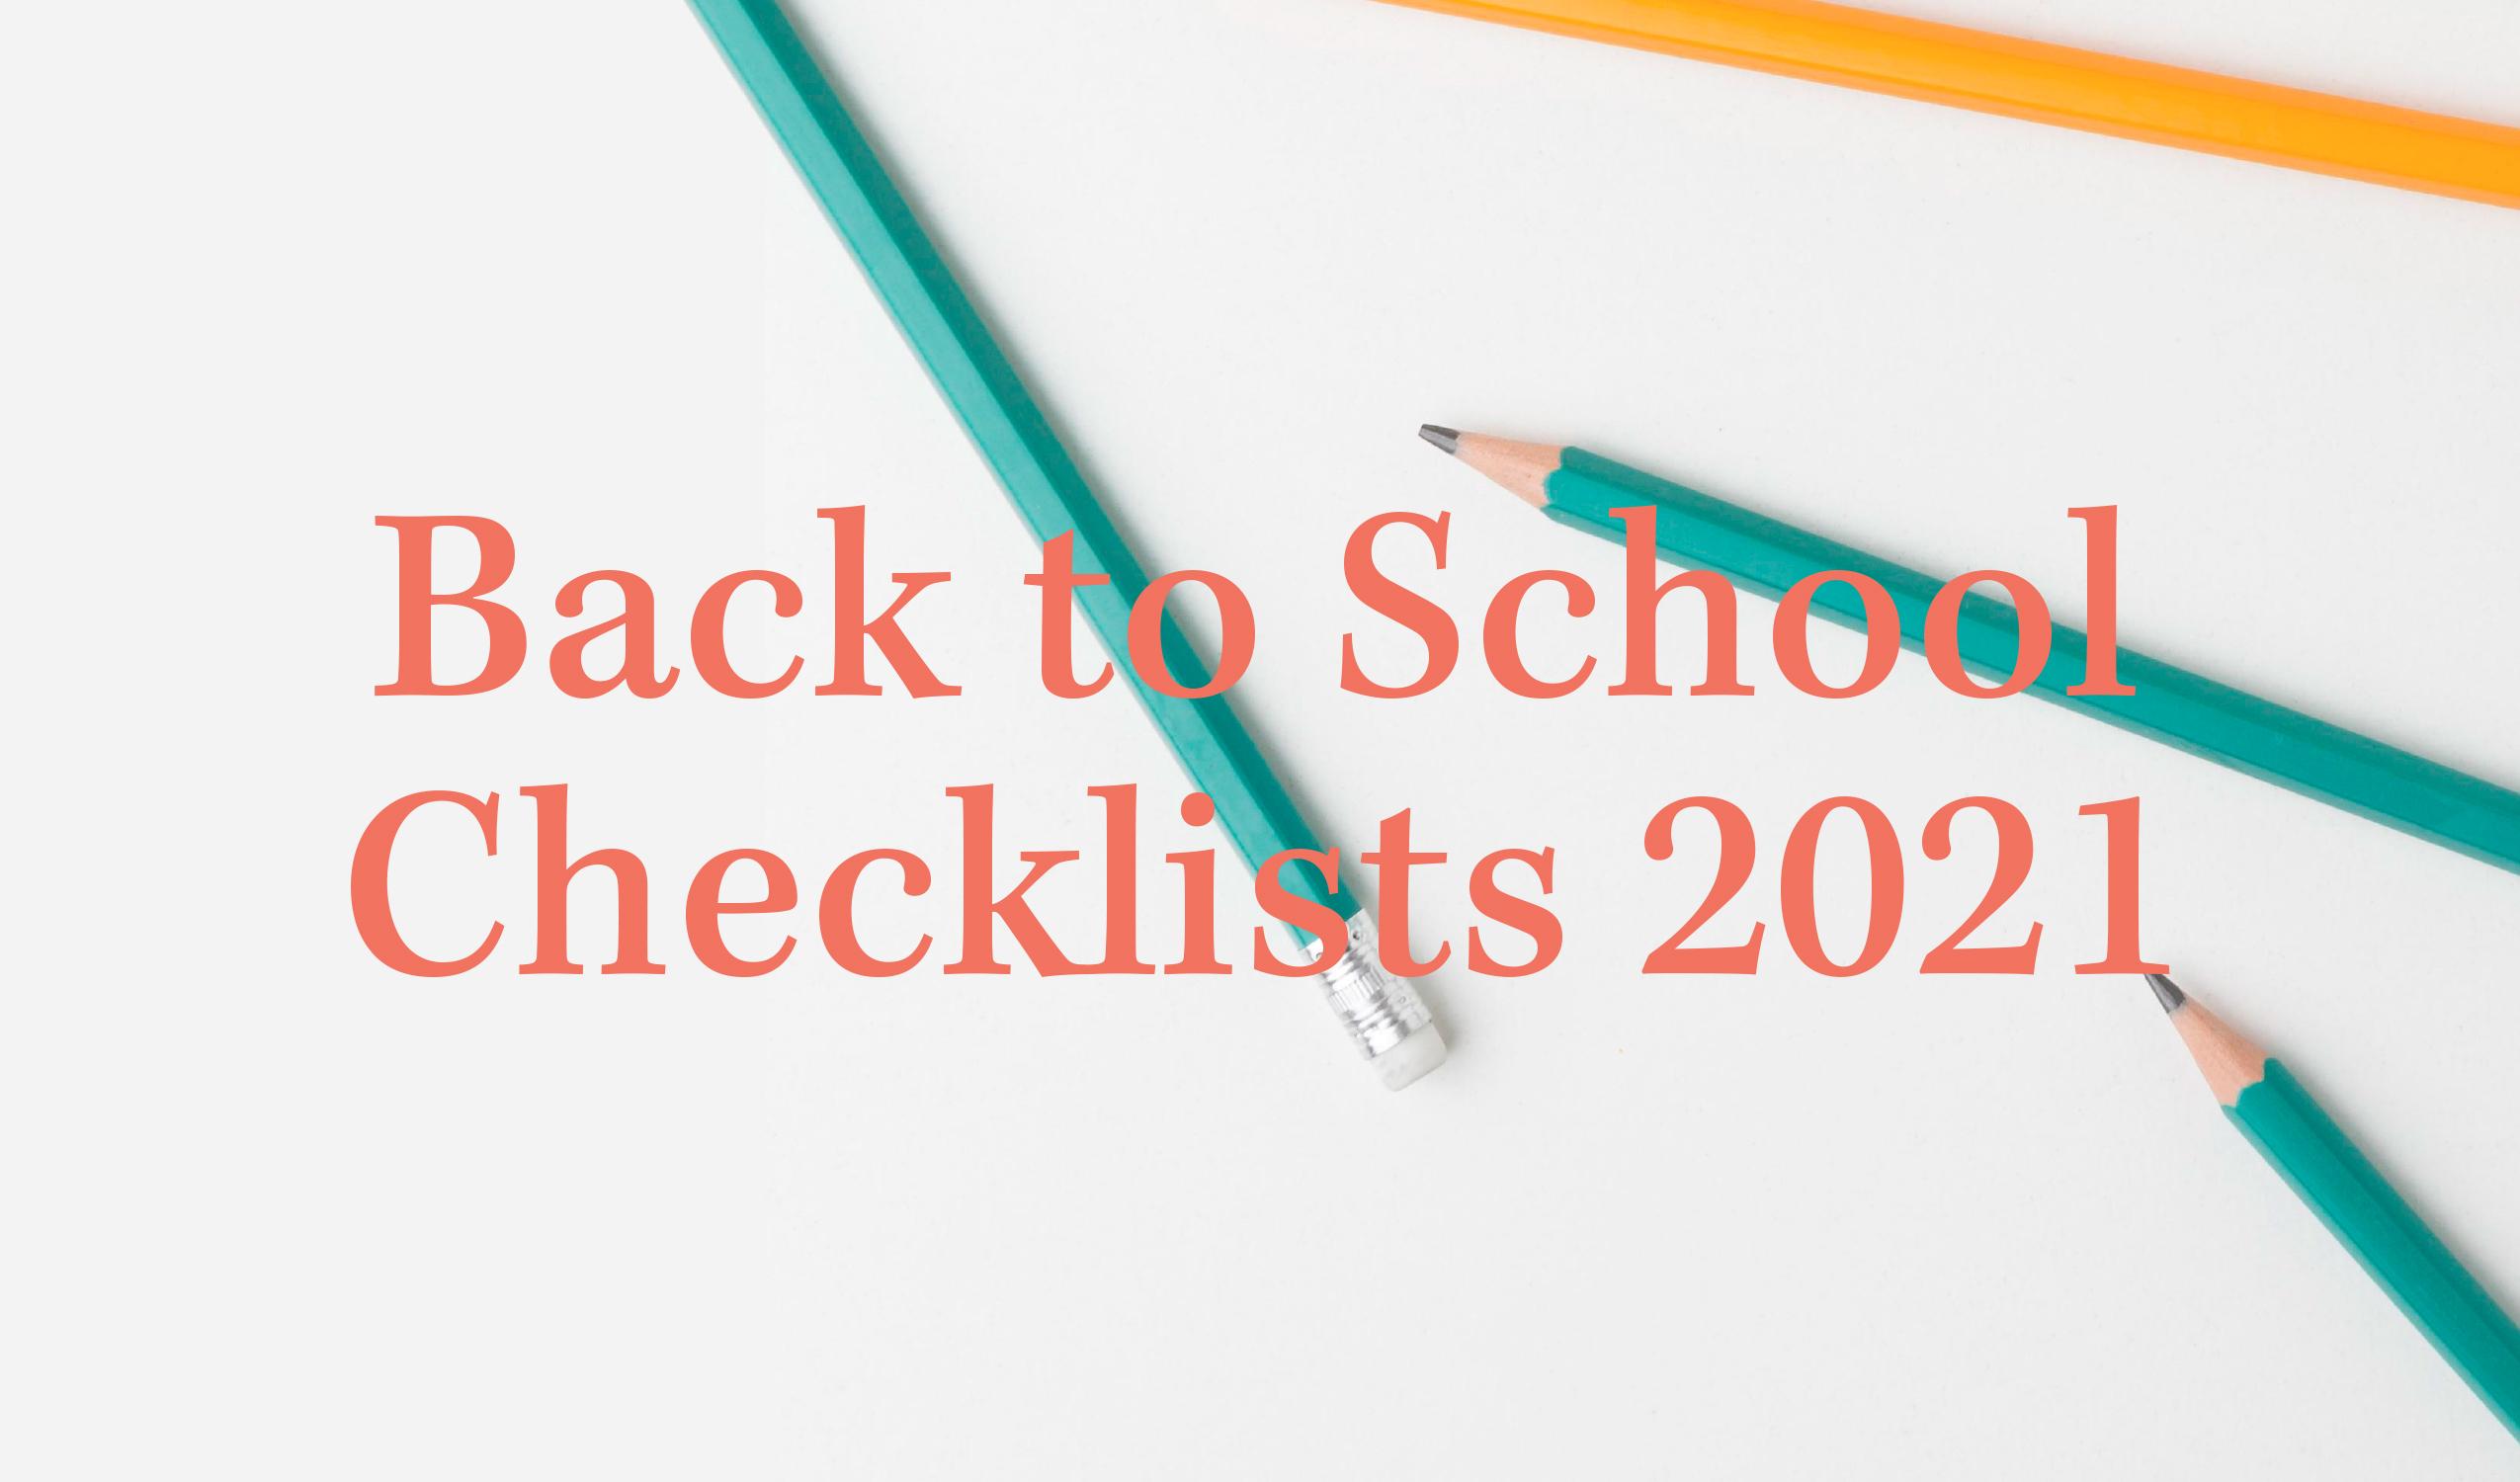 Back to School Checklists 2021